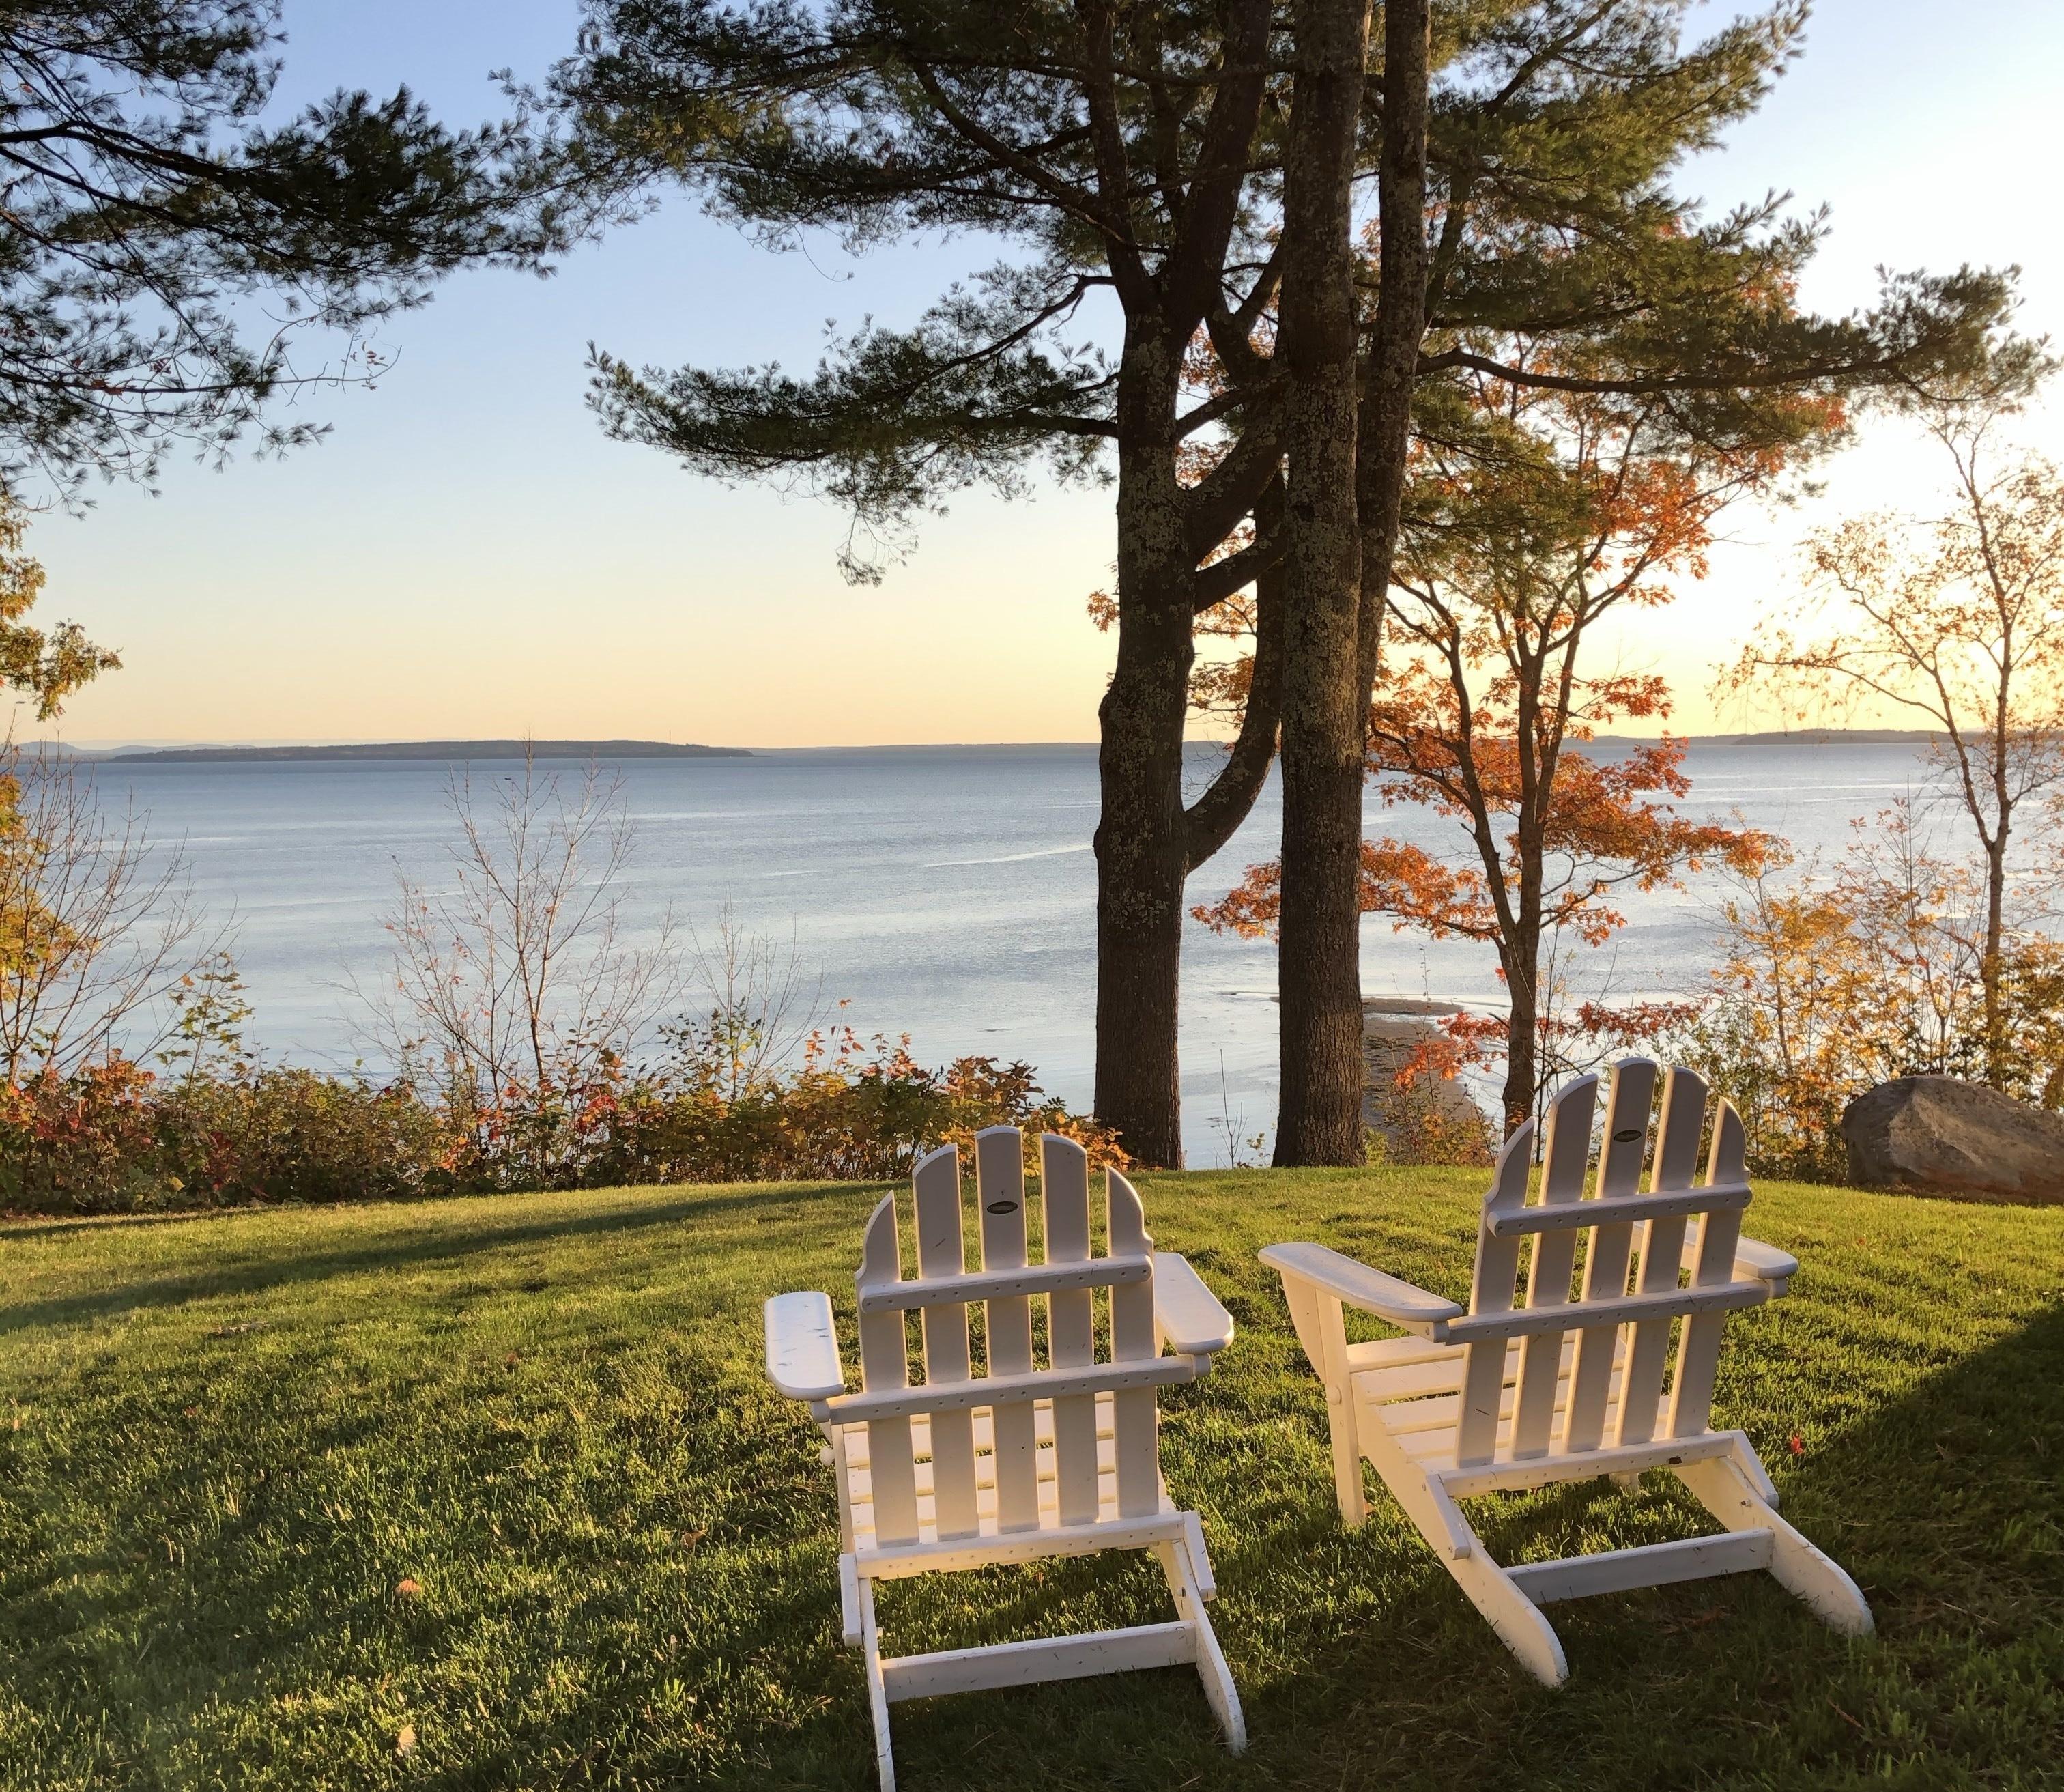 Waldo County, Maine, United States of America